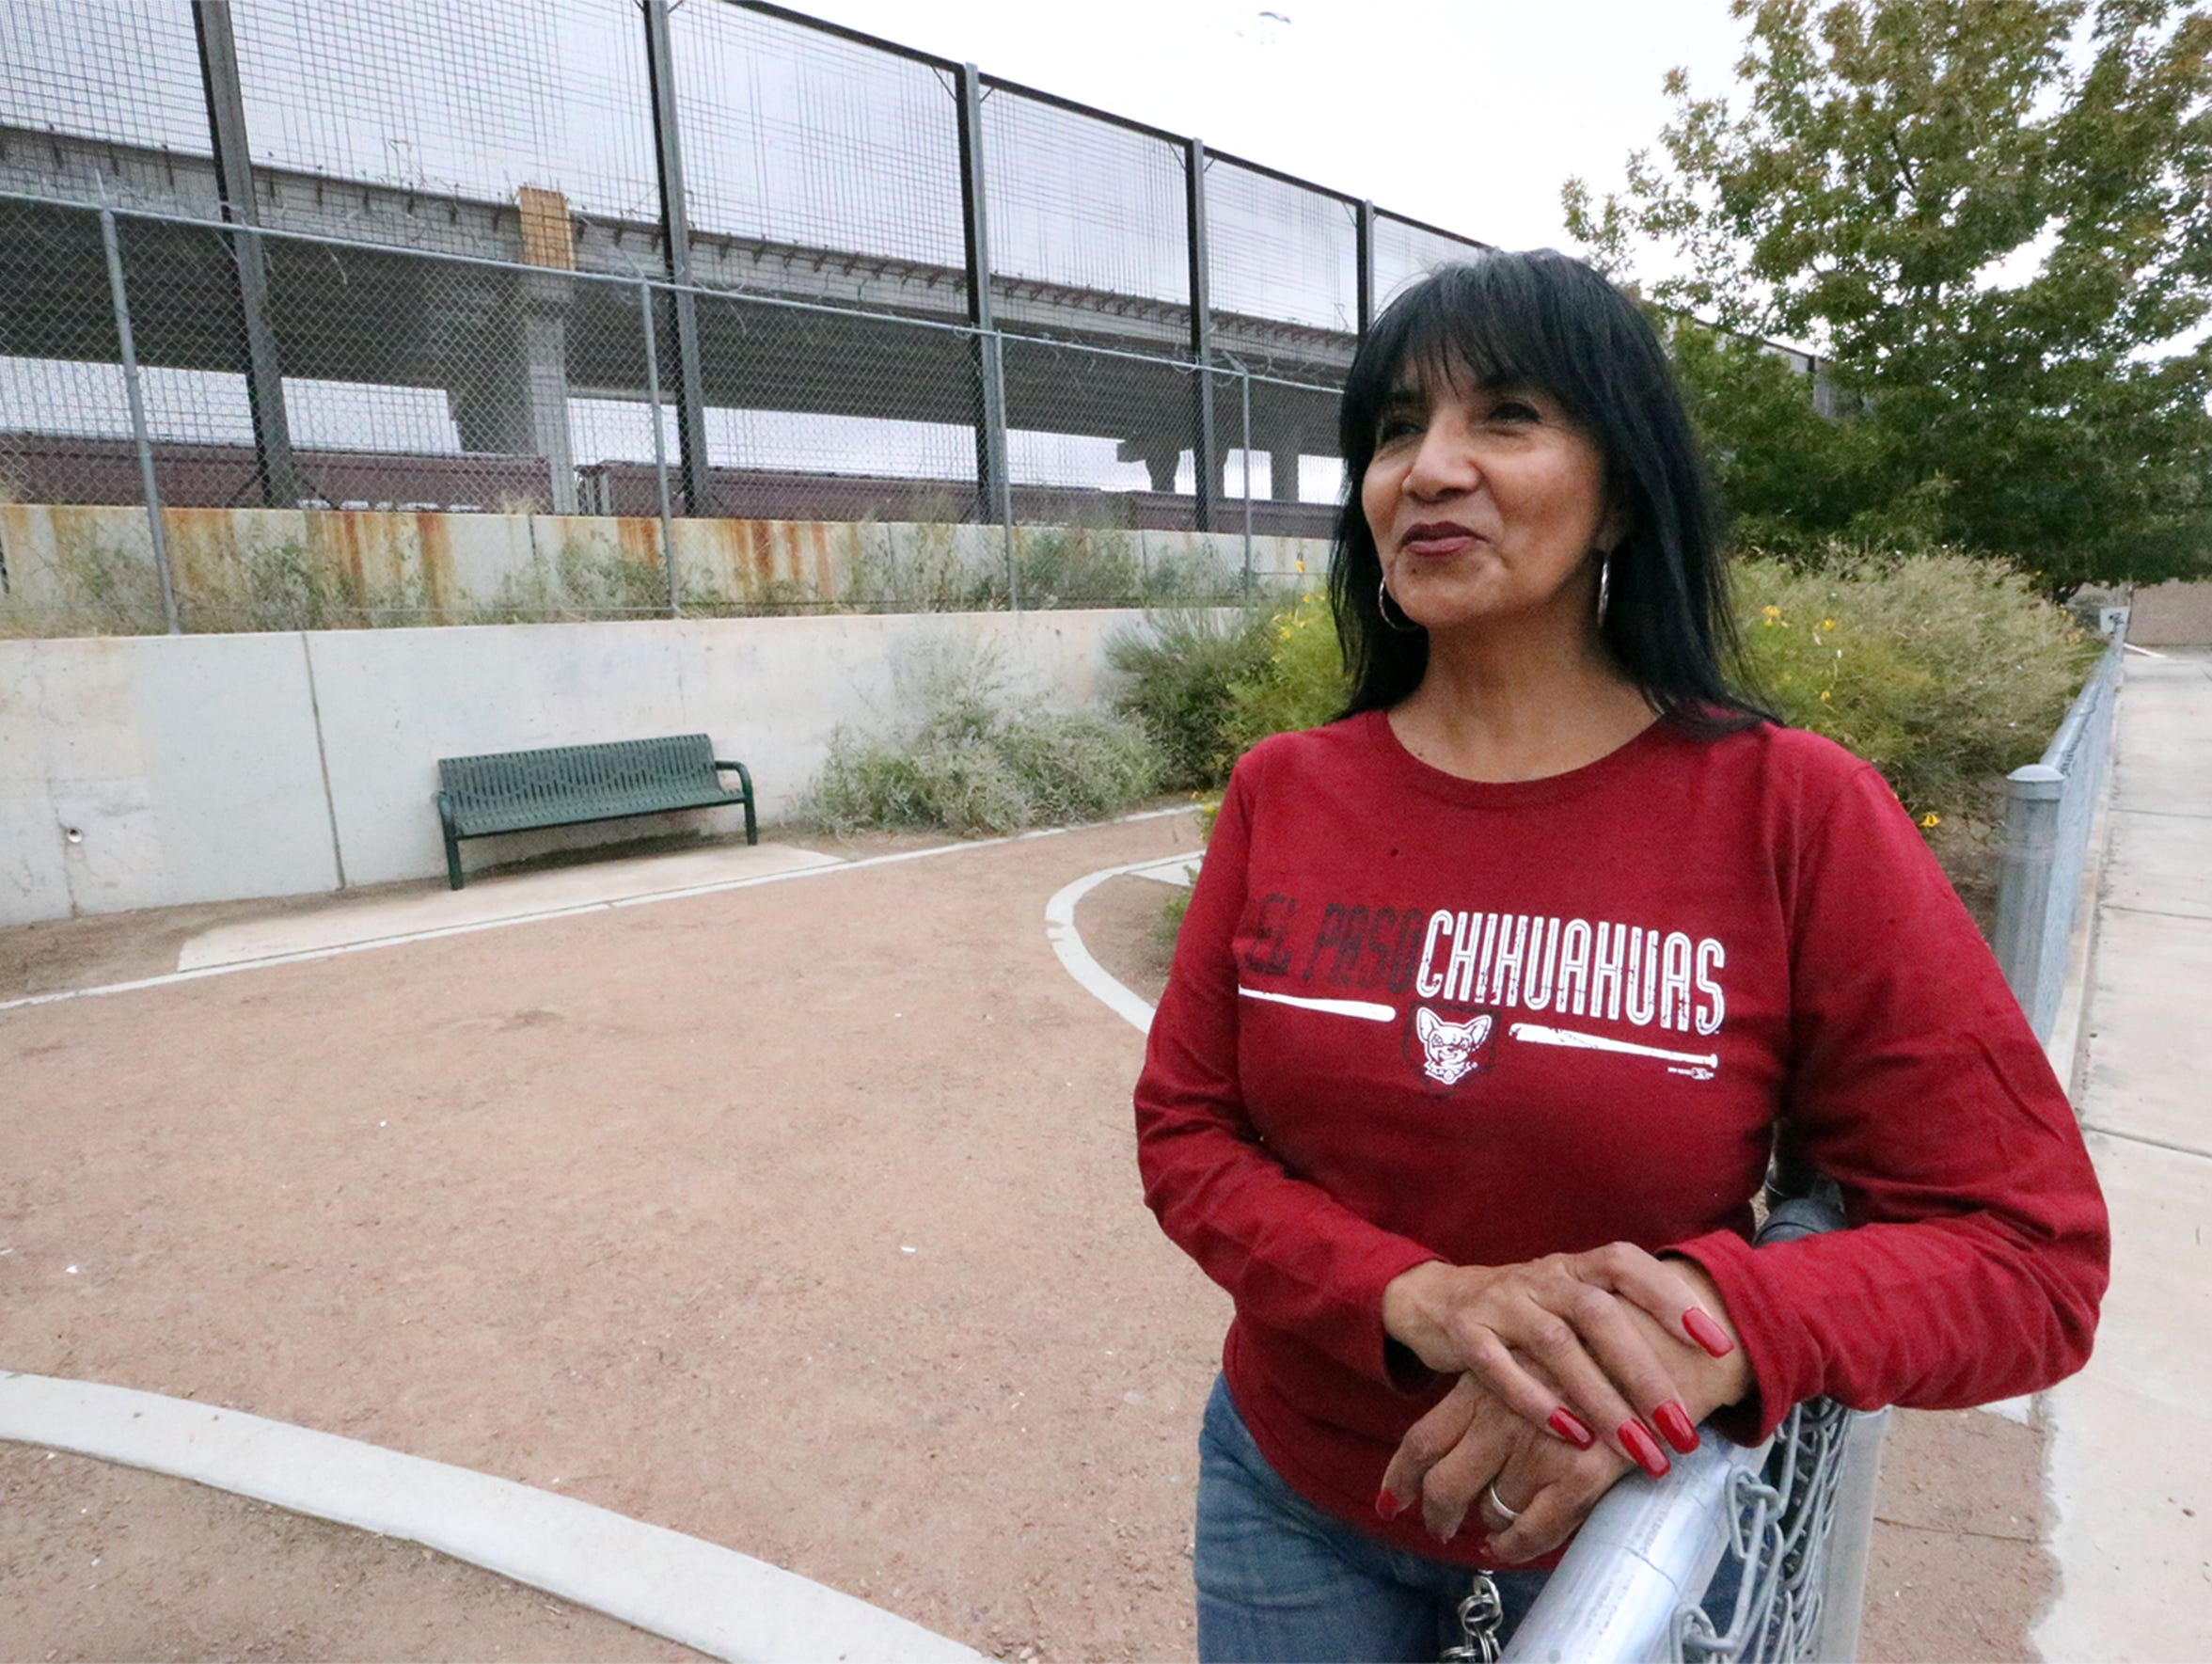 Lifelong Chihuahuita resident Mannys Silva Rodriguez